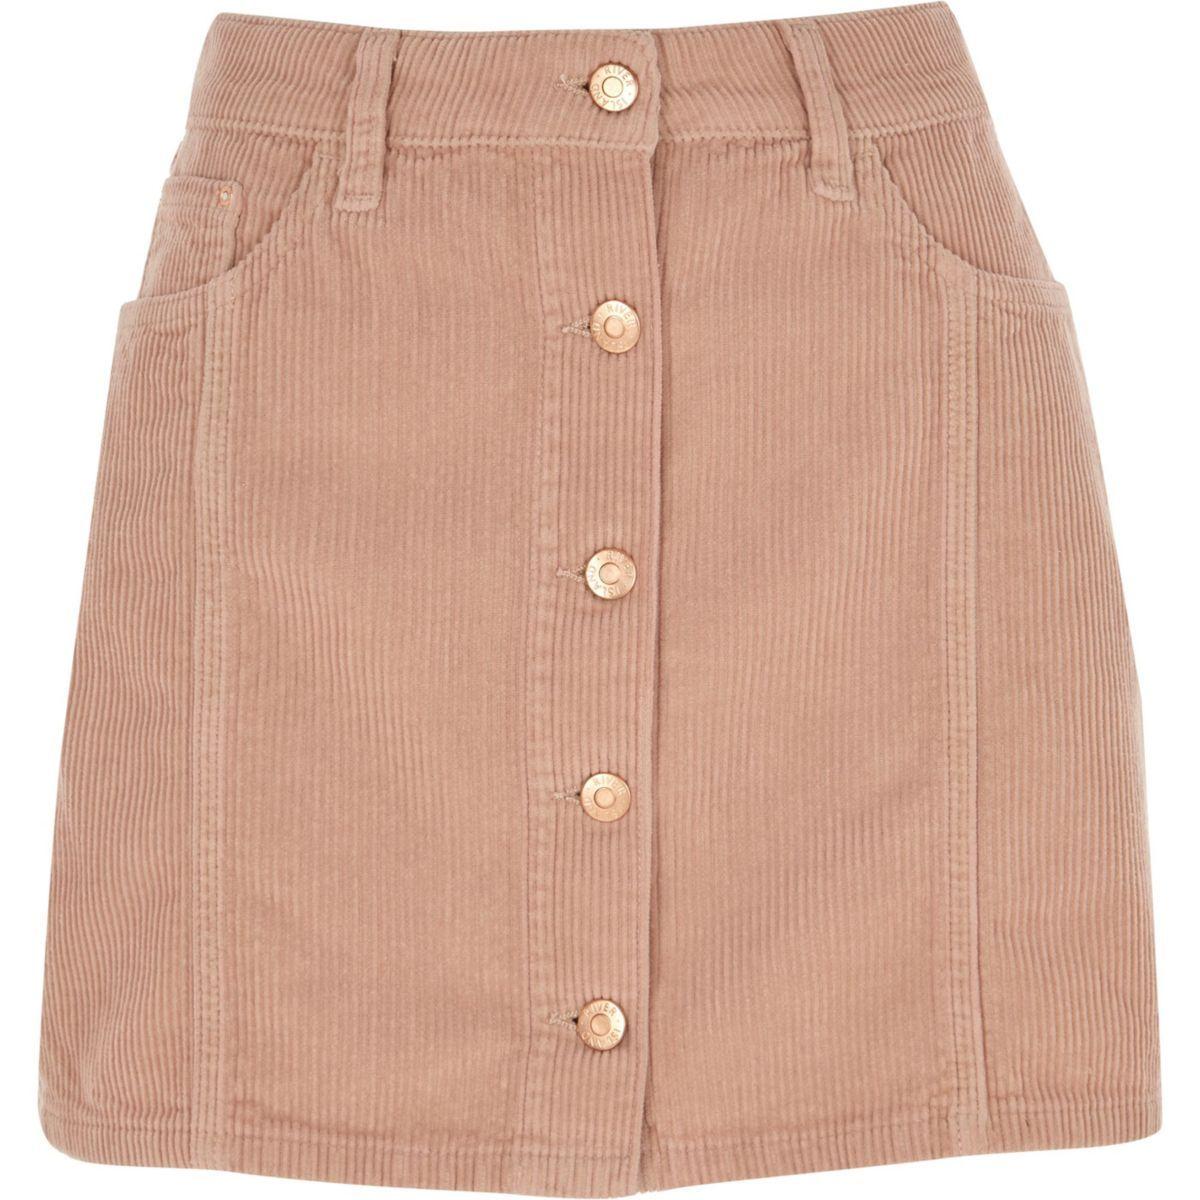 1a1d100d4 Pink corduroy button through mini skirt - Mini Skirts - Skirts - women